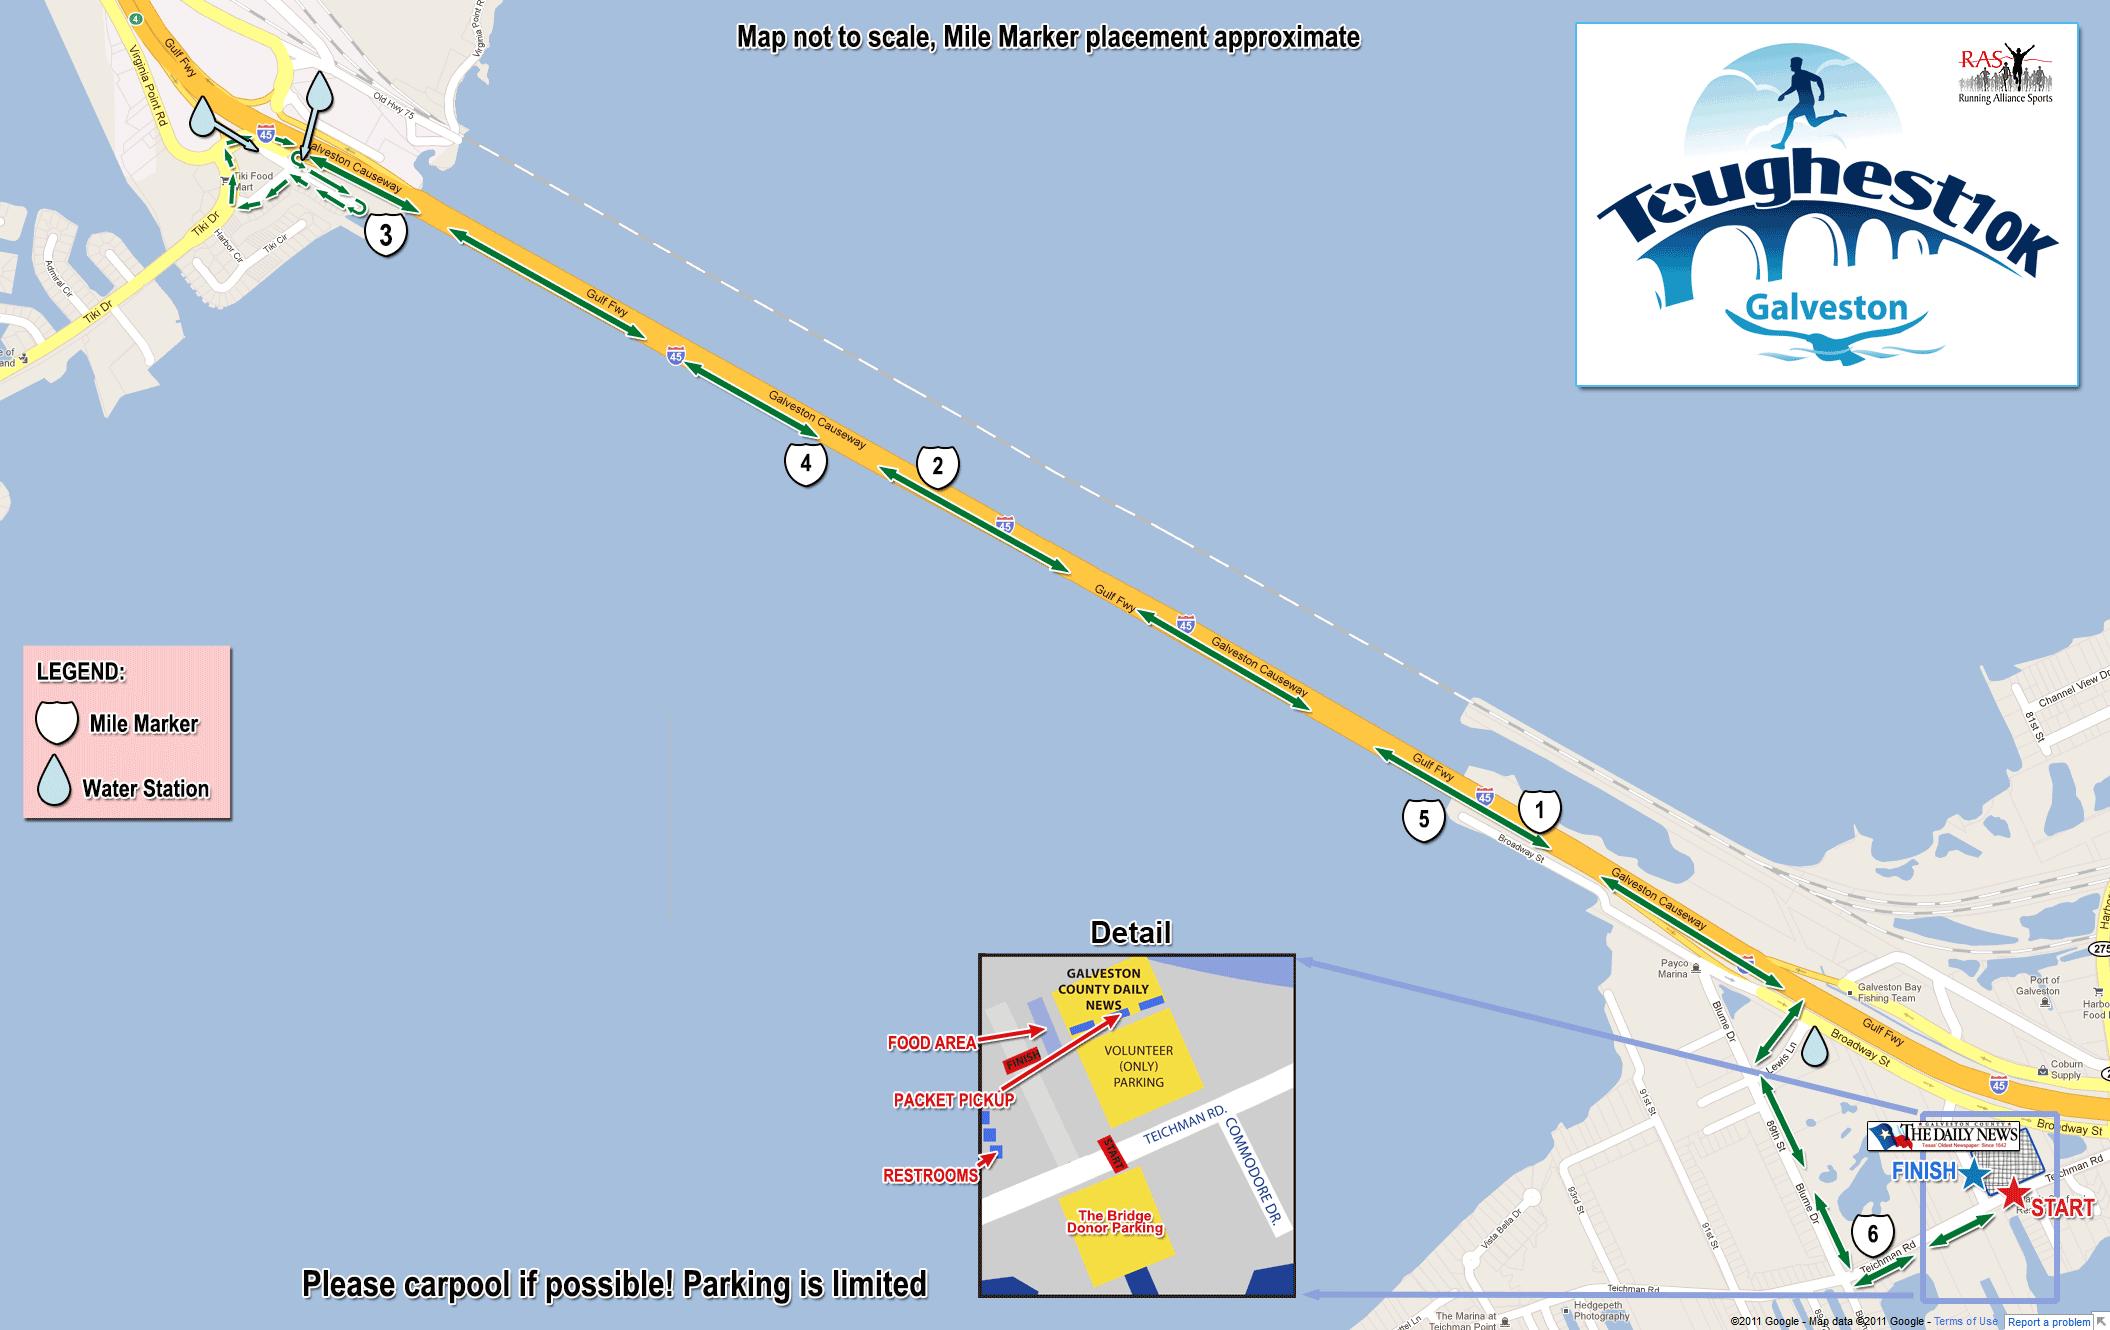 The Toughest 10K Galveston